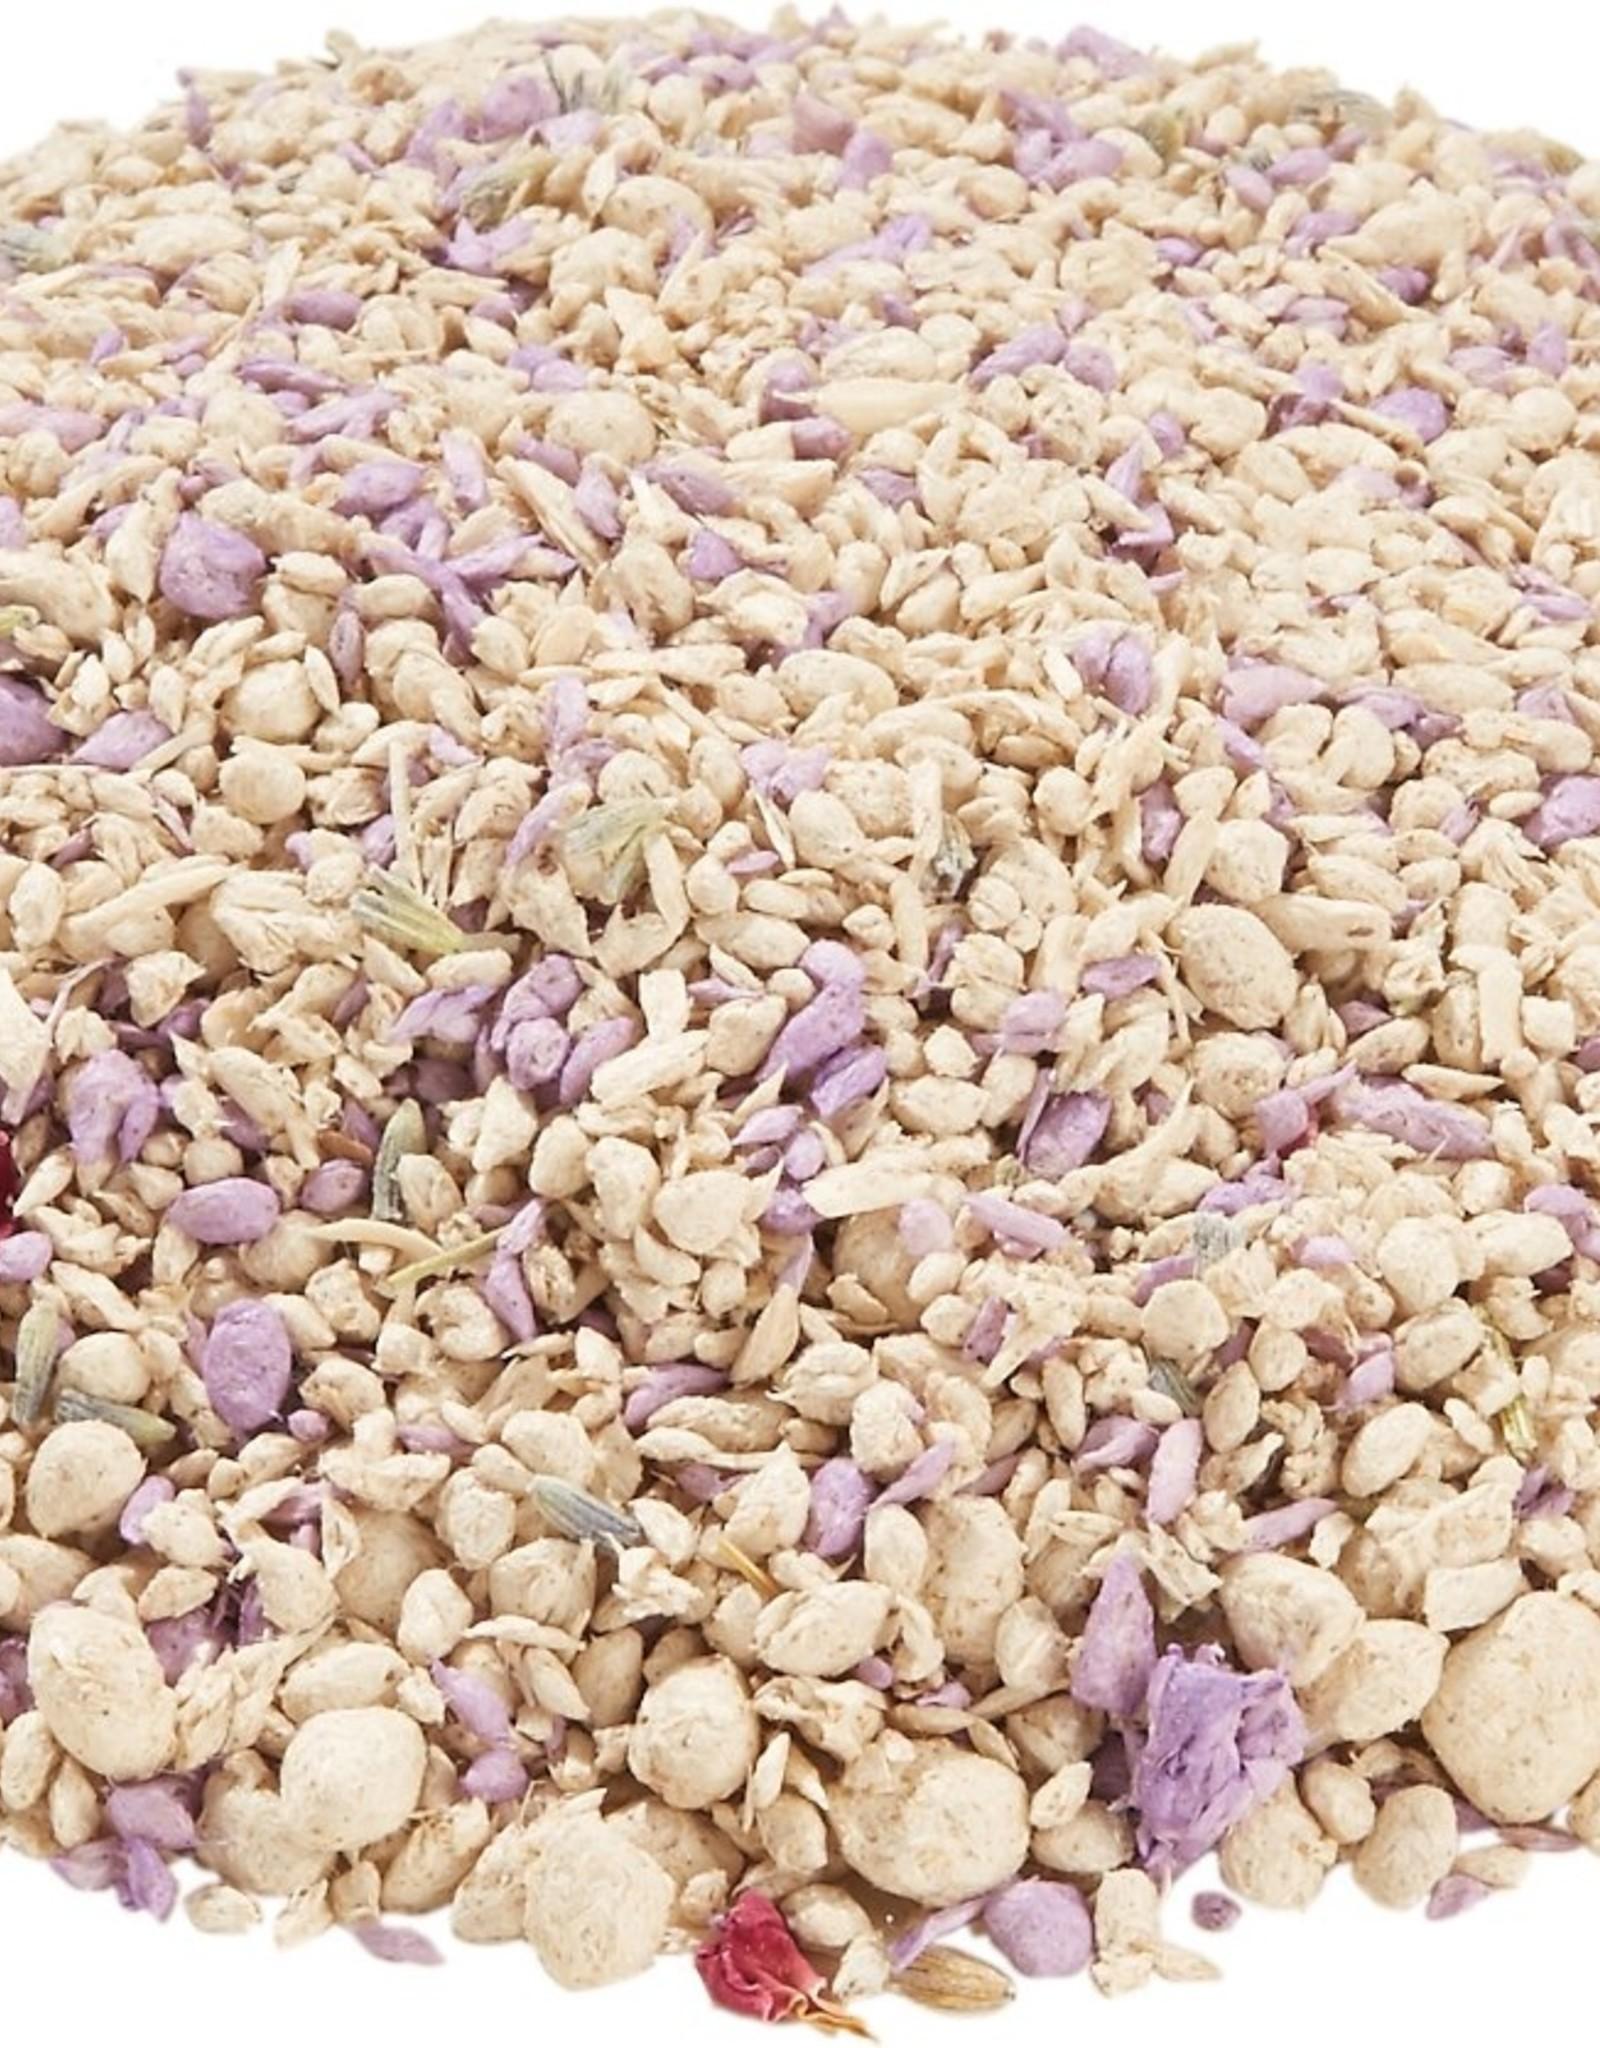 Kaytee Lavender Bedding 27.5L